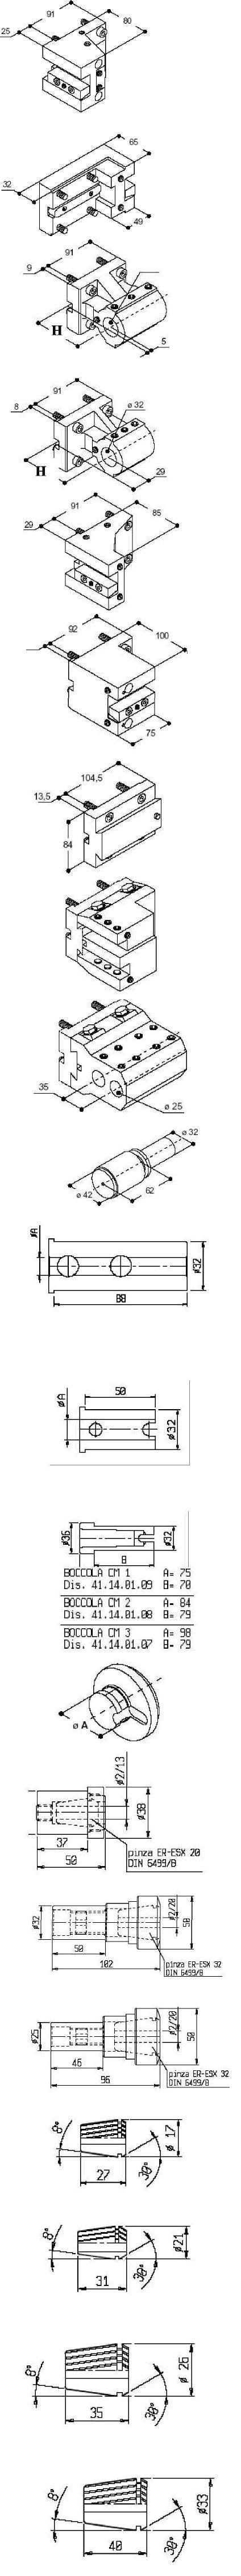 b470sm-osnastka1